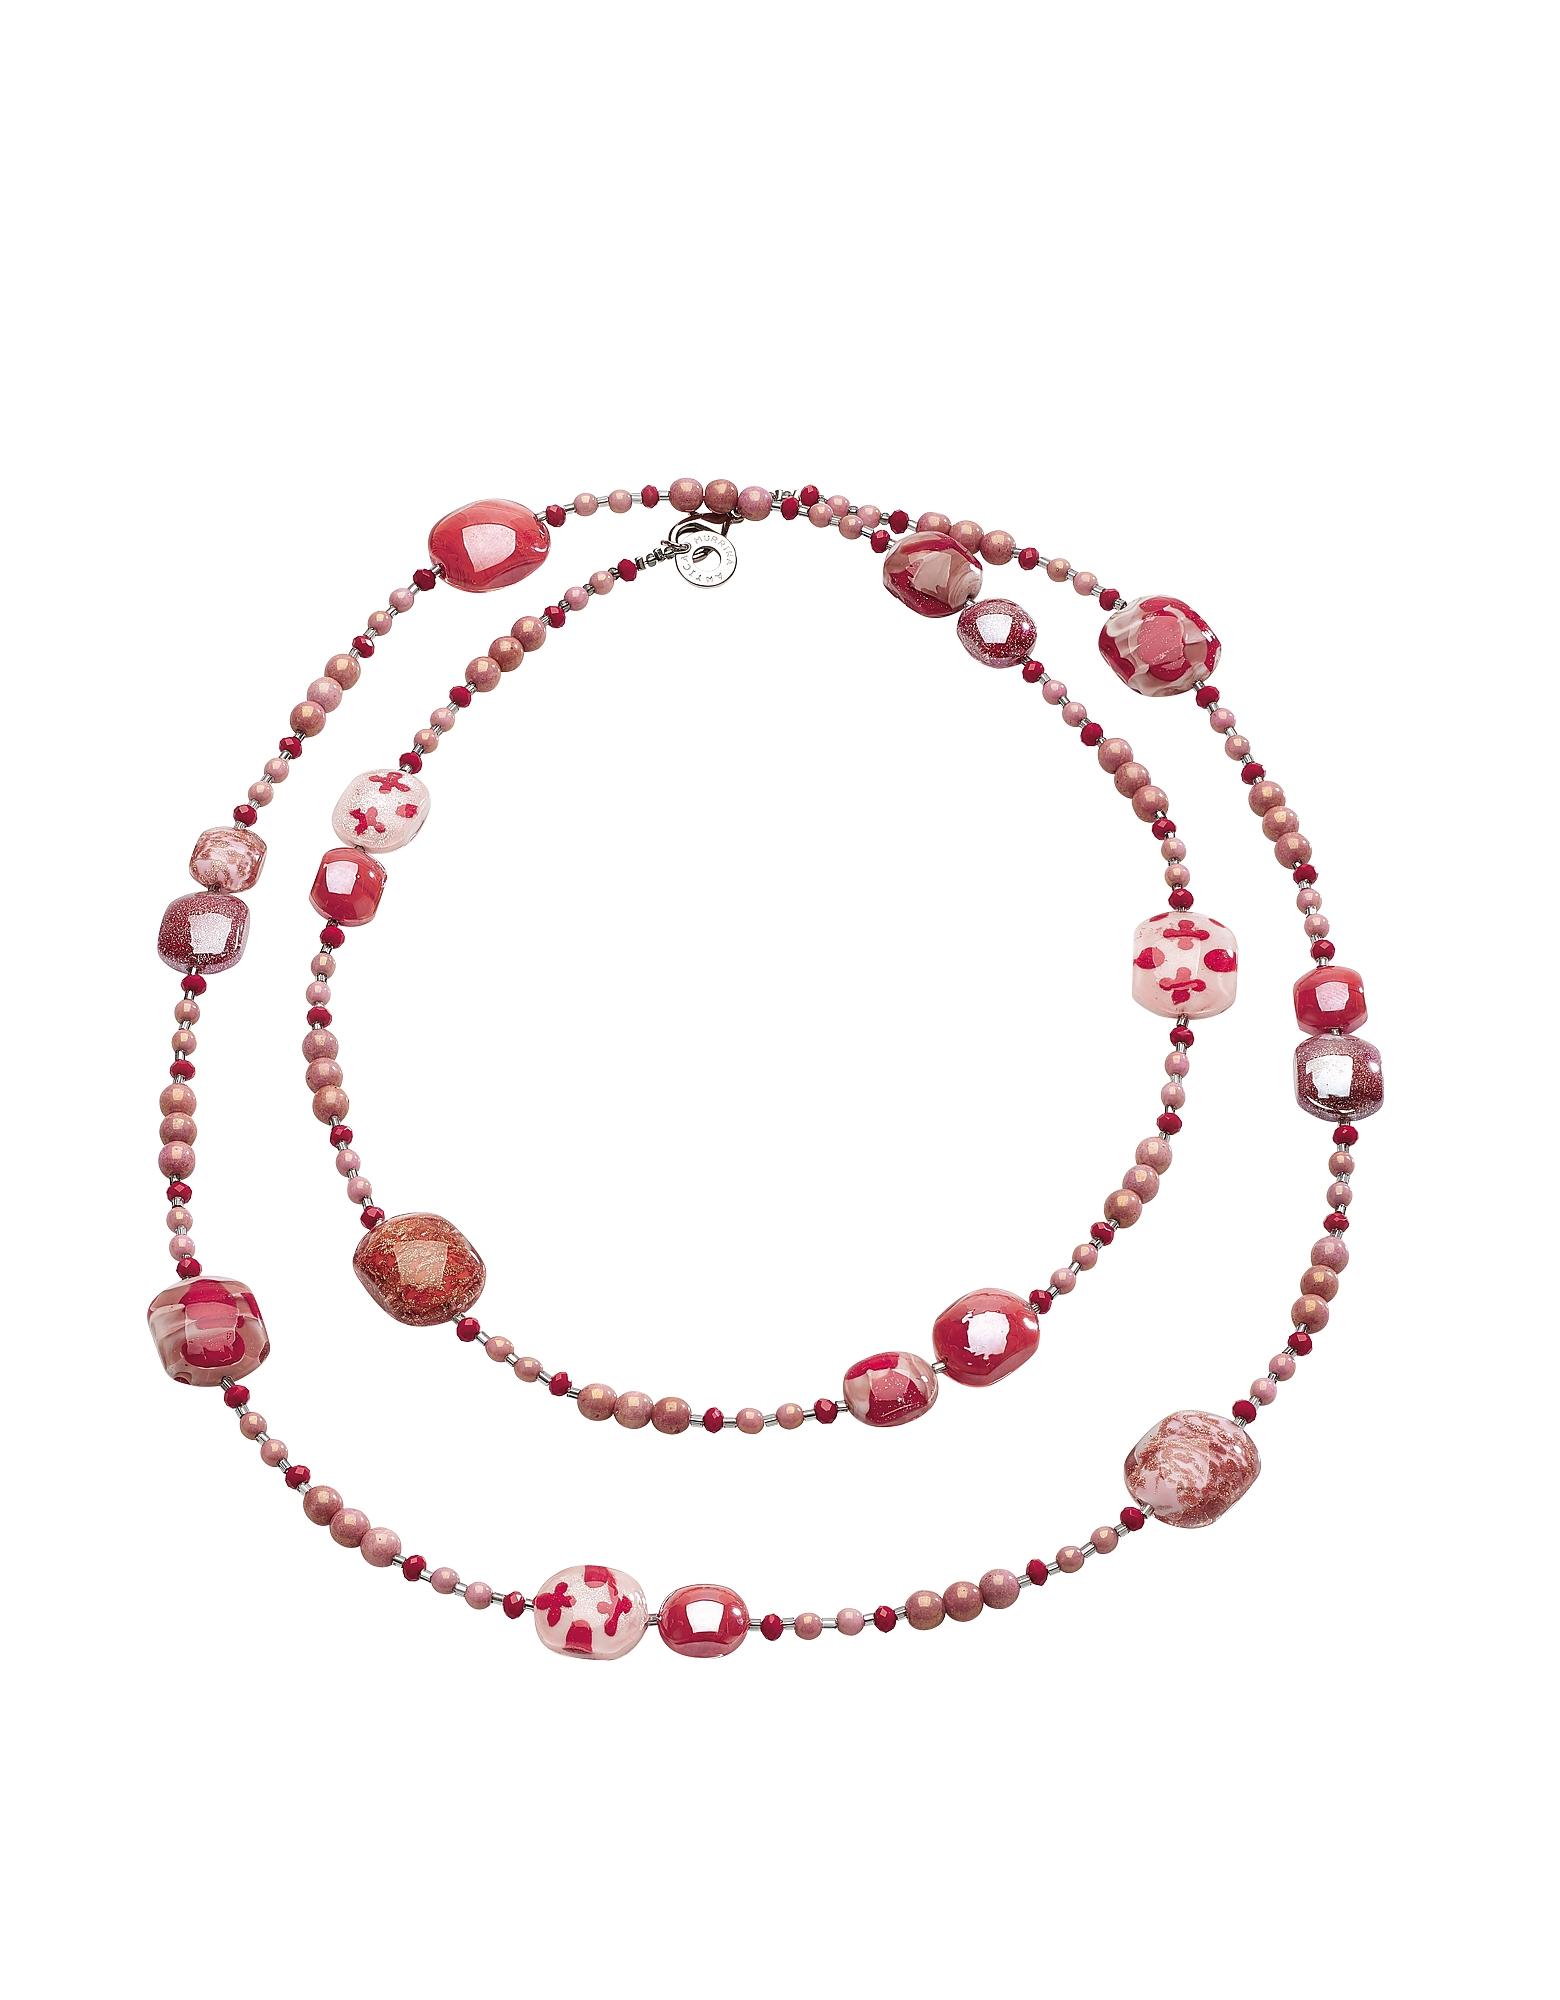 Antica Murrina Necklaces, Long Domino Necklace